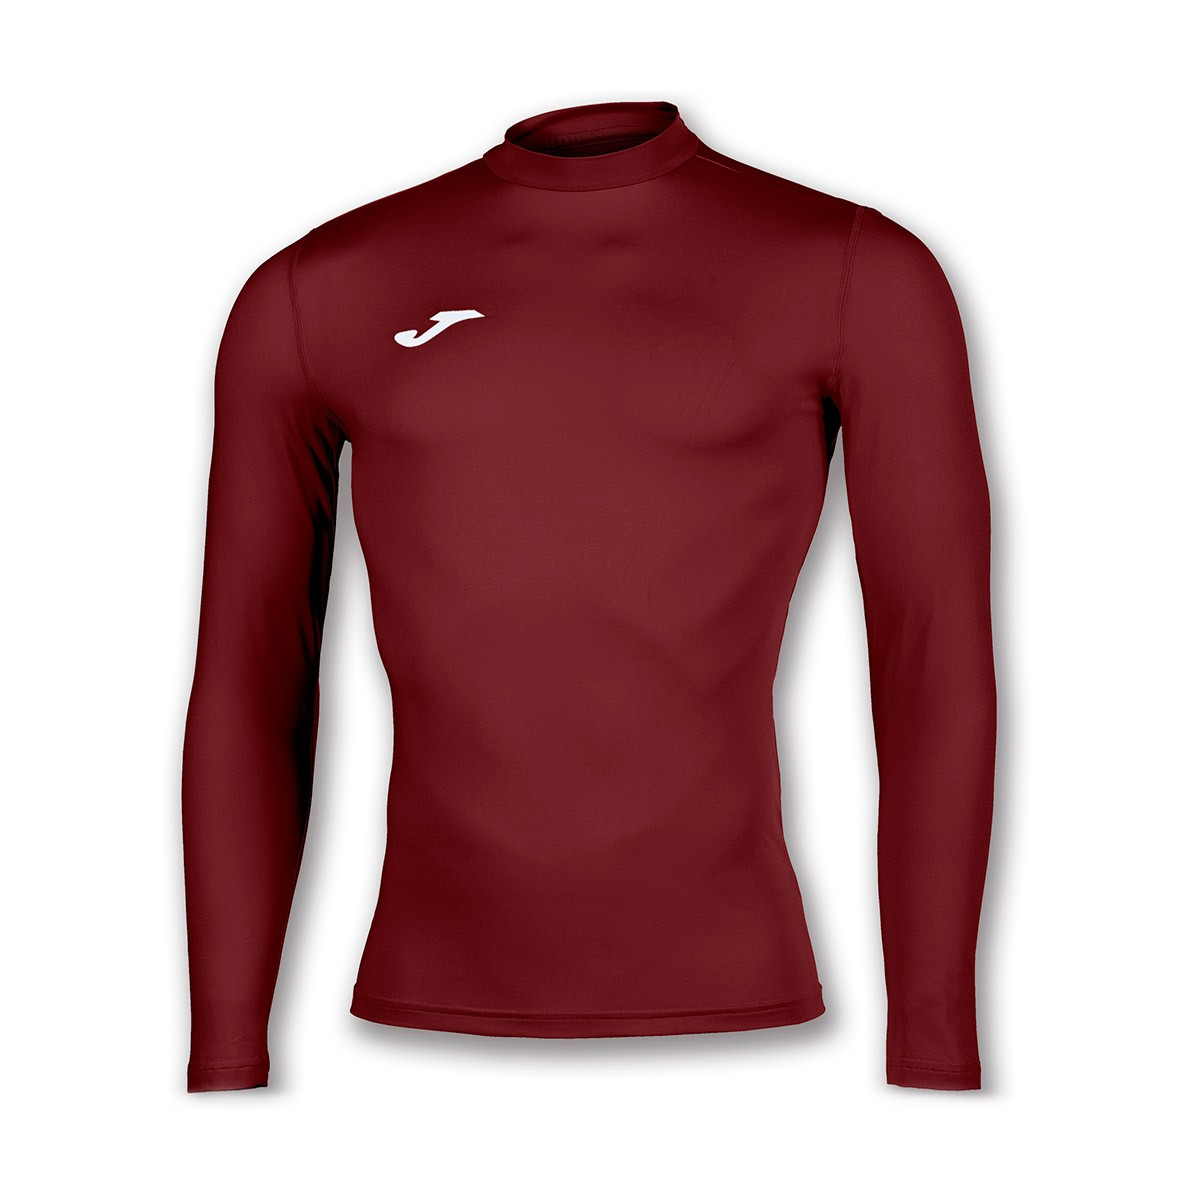 fa62776d1 Camiseta Joma Térmica m l Brama Academy Burdeos - Tienda de fútbol Fútbol  Emotion